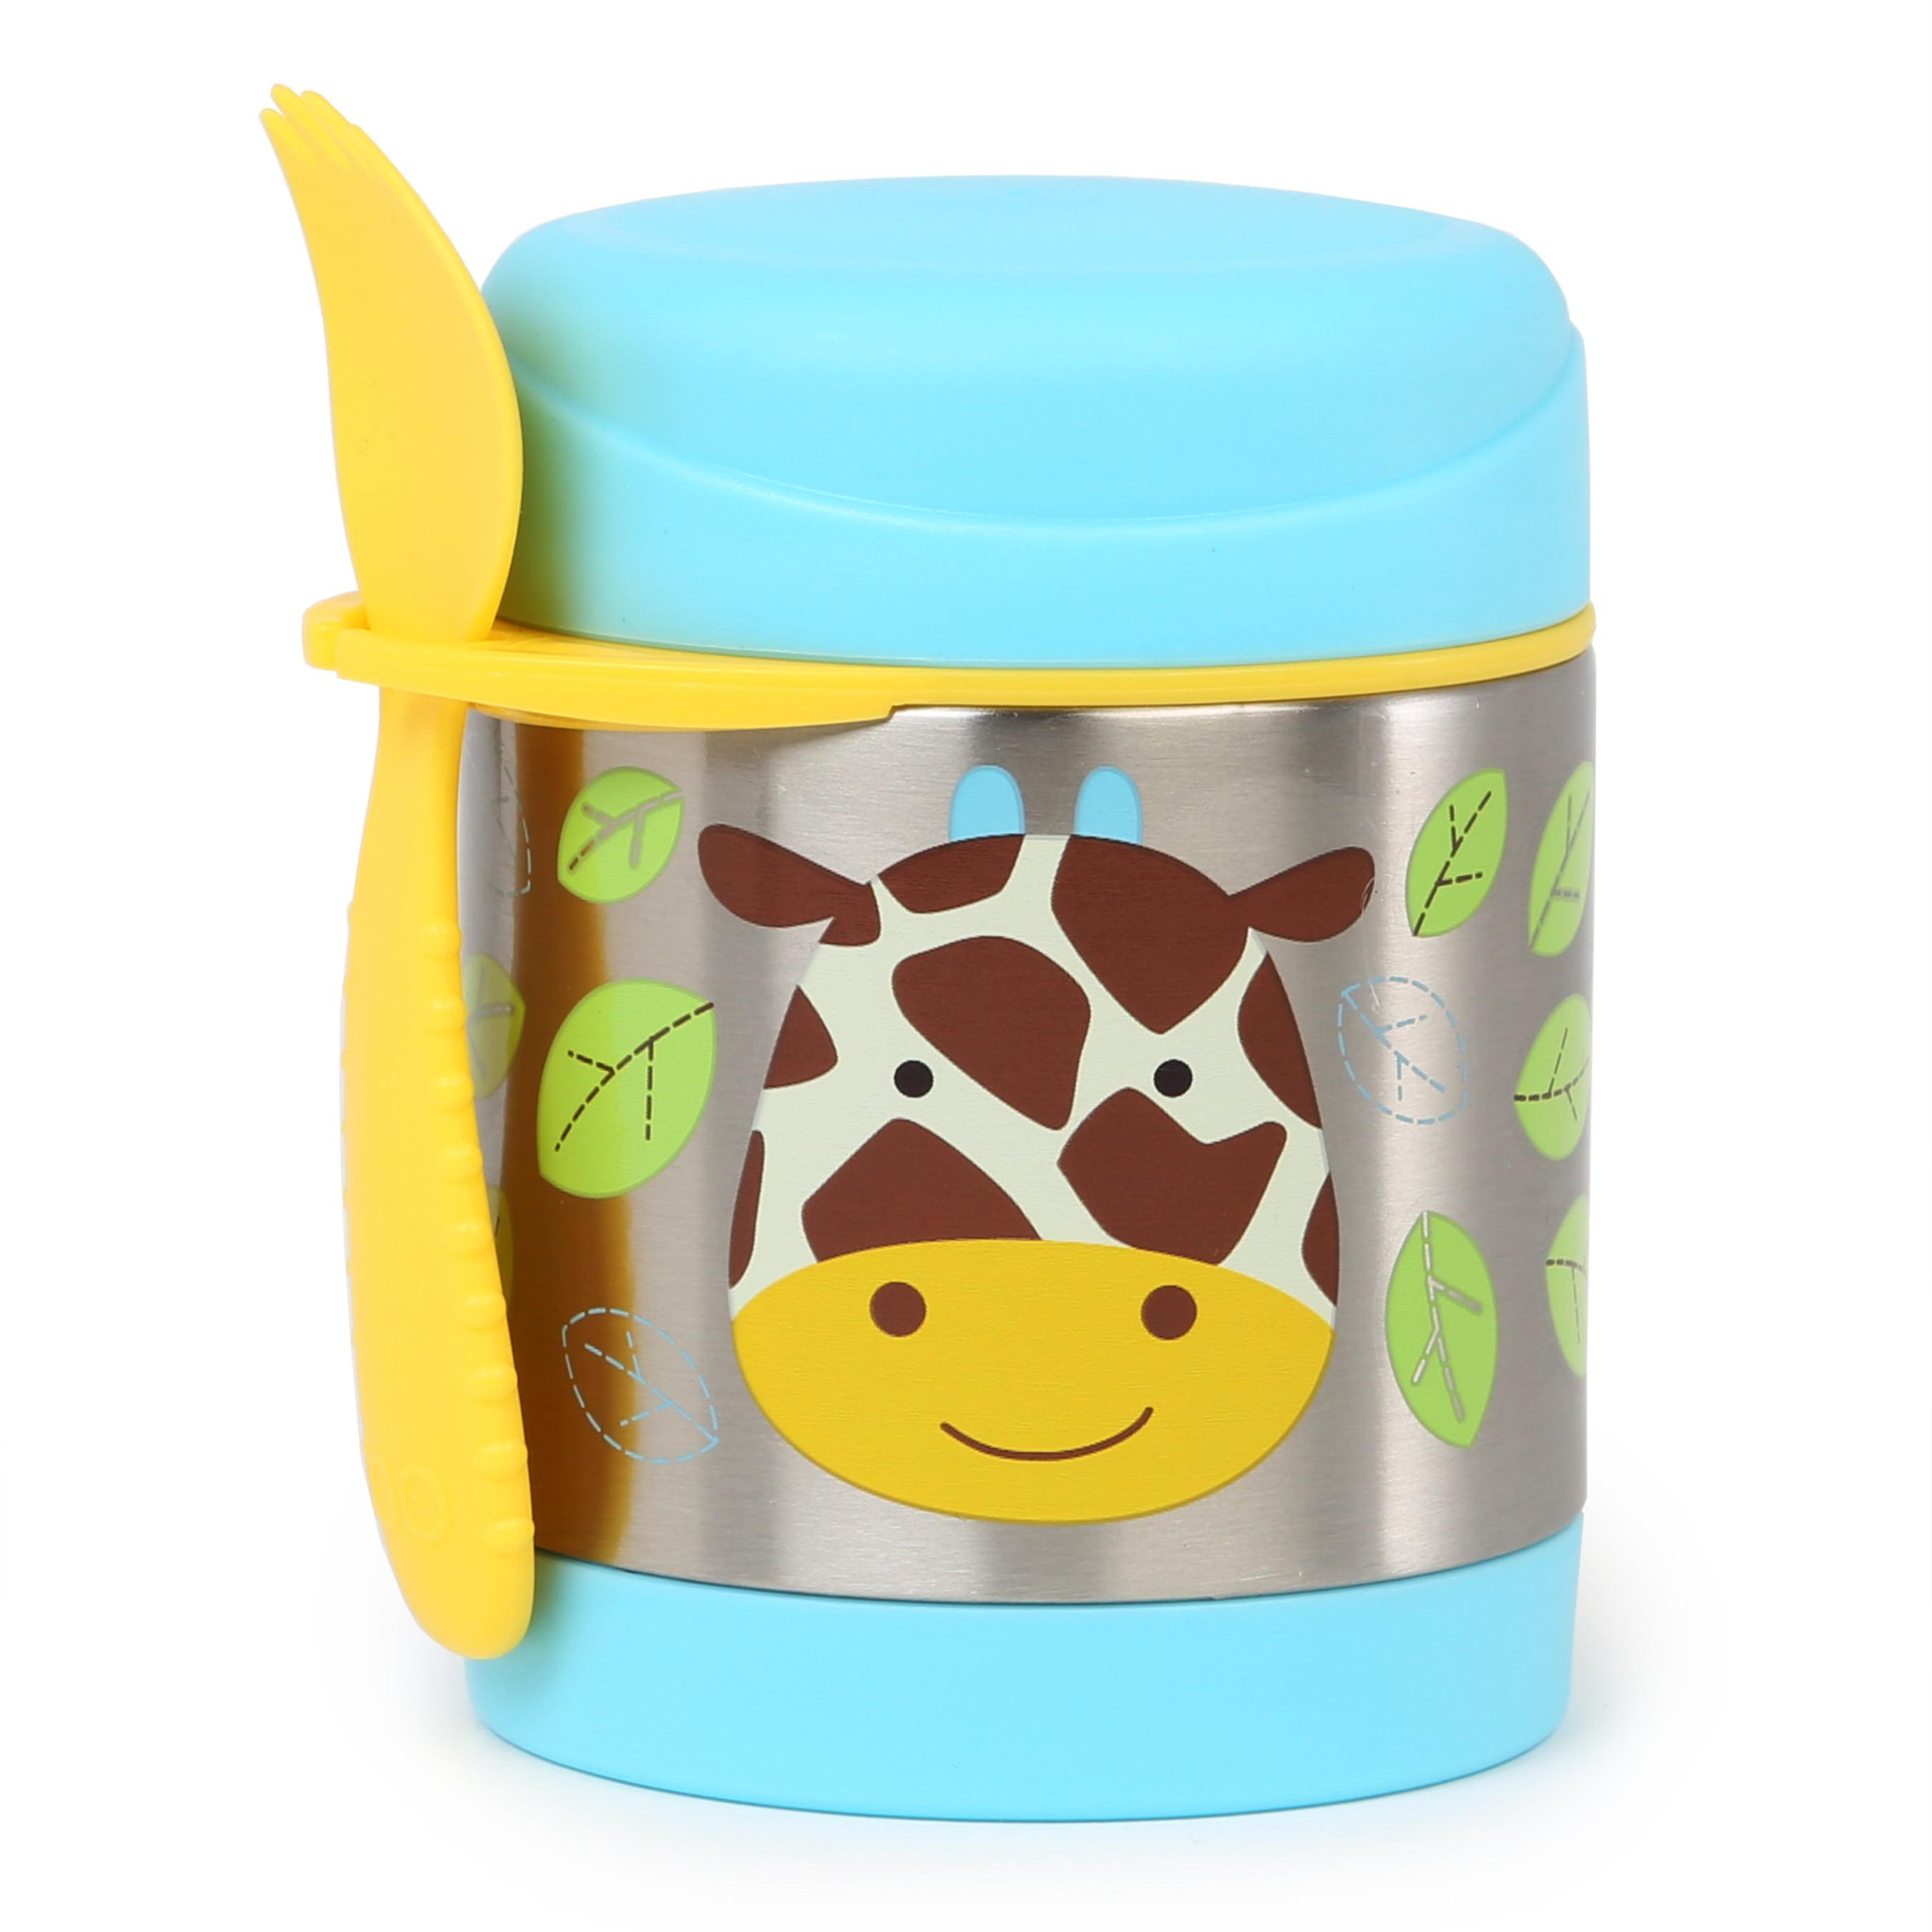 Skip Hop Zoo Insulated Food Jar, Giraffe